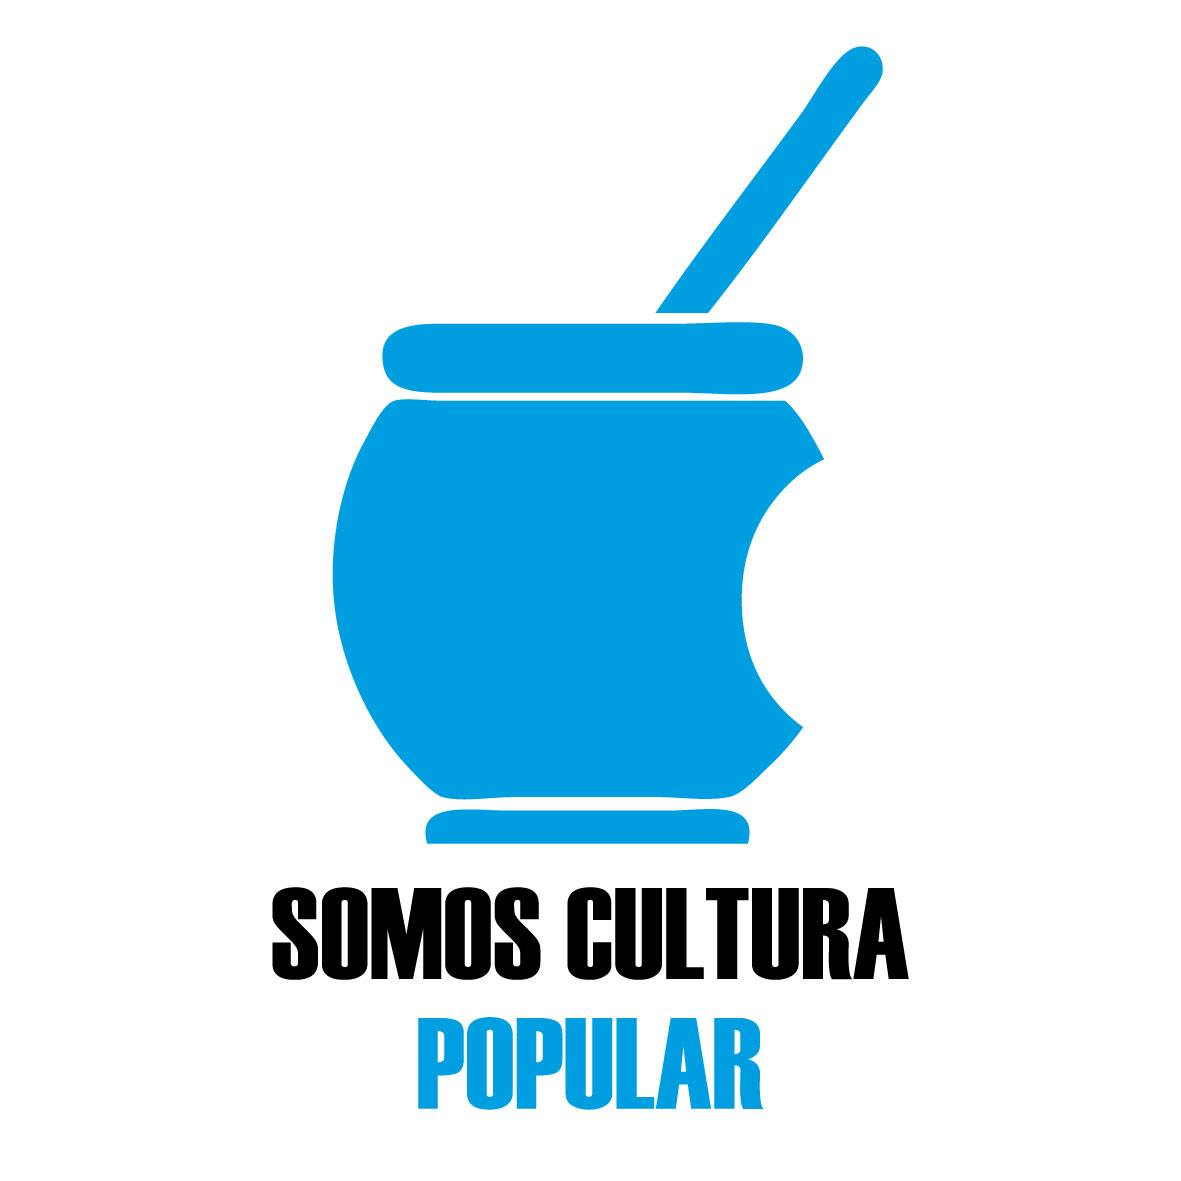 SOMOS Cultura Popular